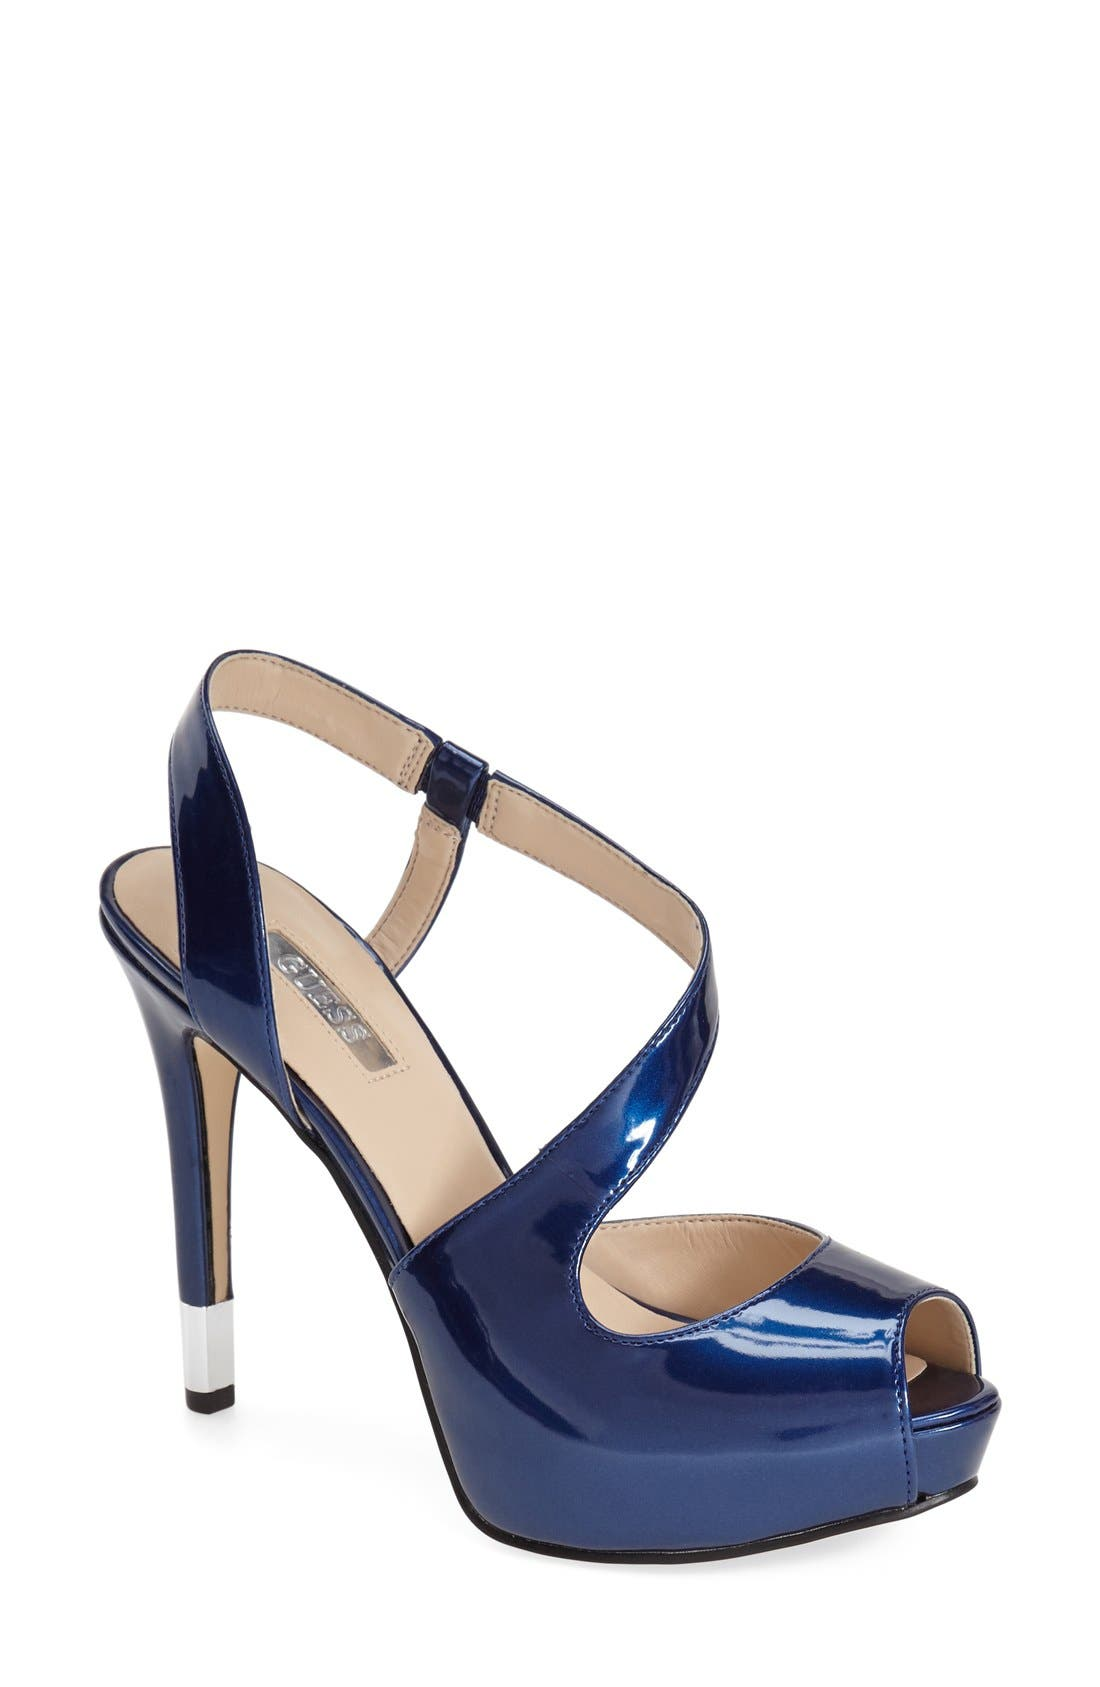 Alternate Image 1 Selected - GUESS 'Hilarie' Peep Toe Sandal (Women)